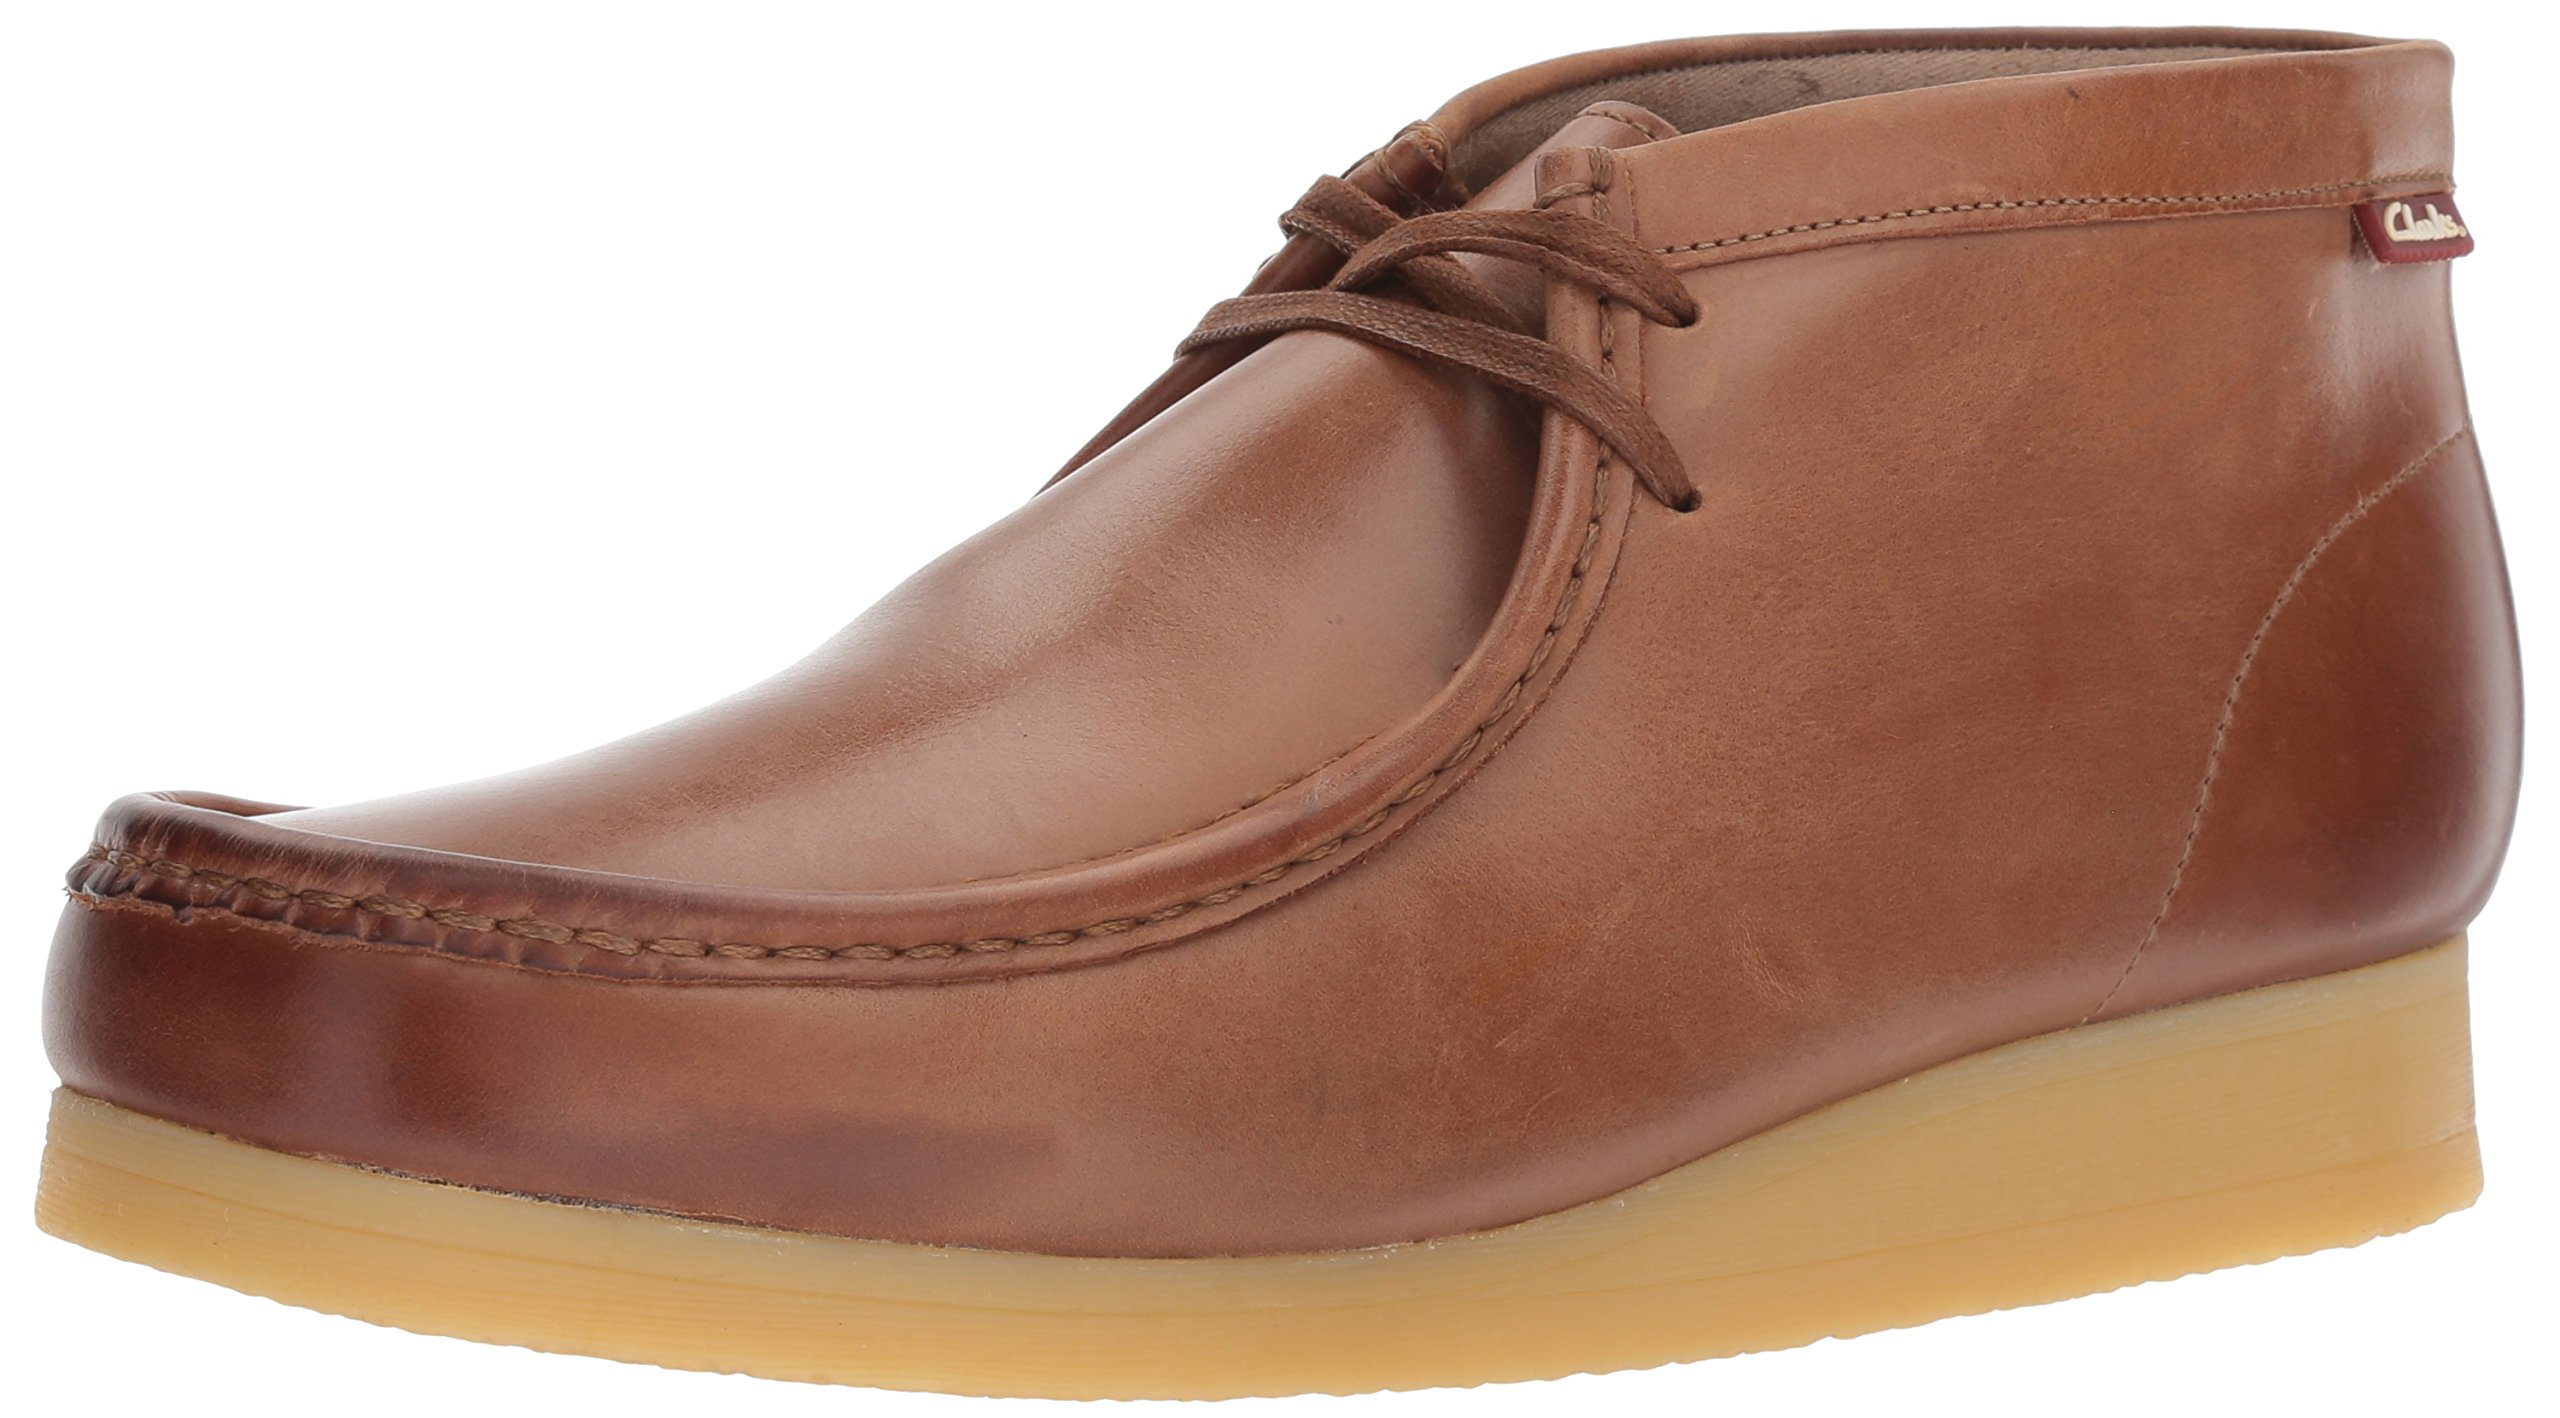 CLARKS Men's Stinson Hi Chukka Boot, Dark Tan Leather, 7.5 M US